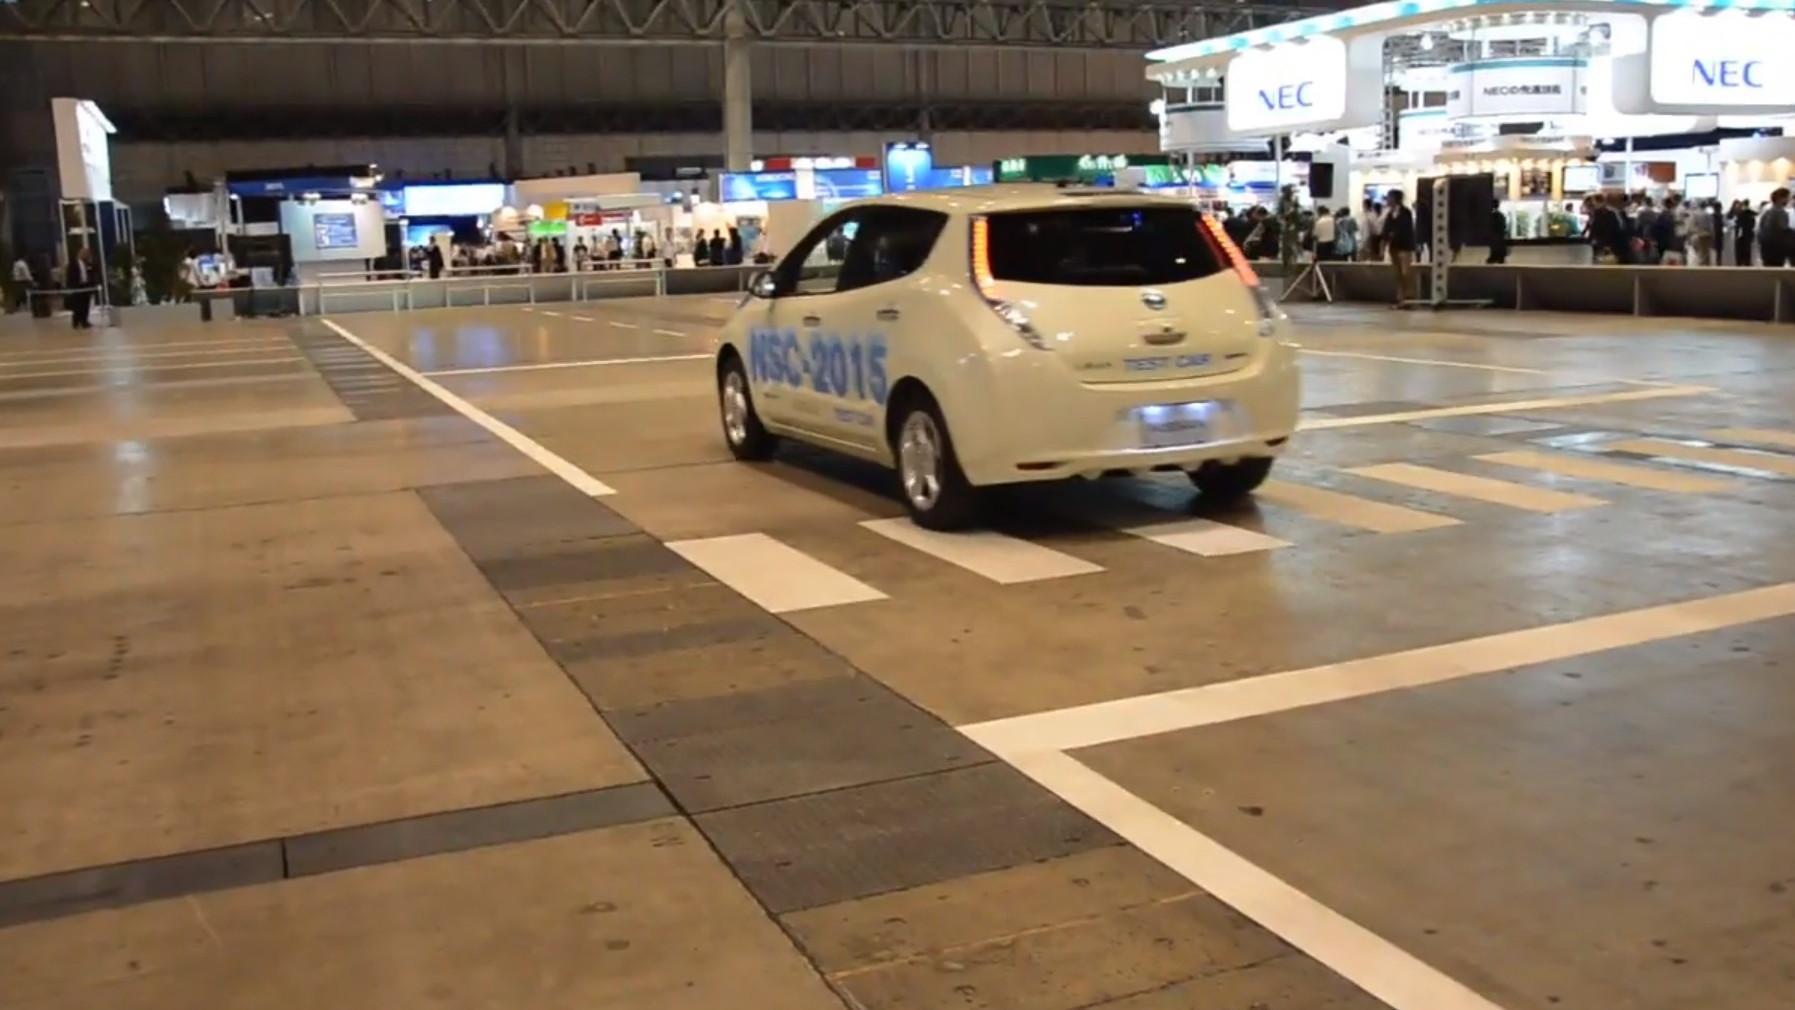 Nissan Leaf Self-Driving Car